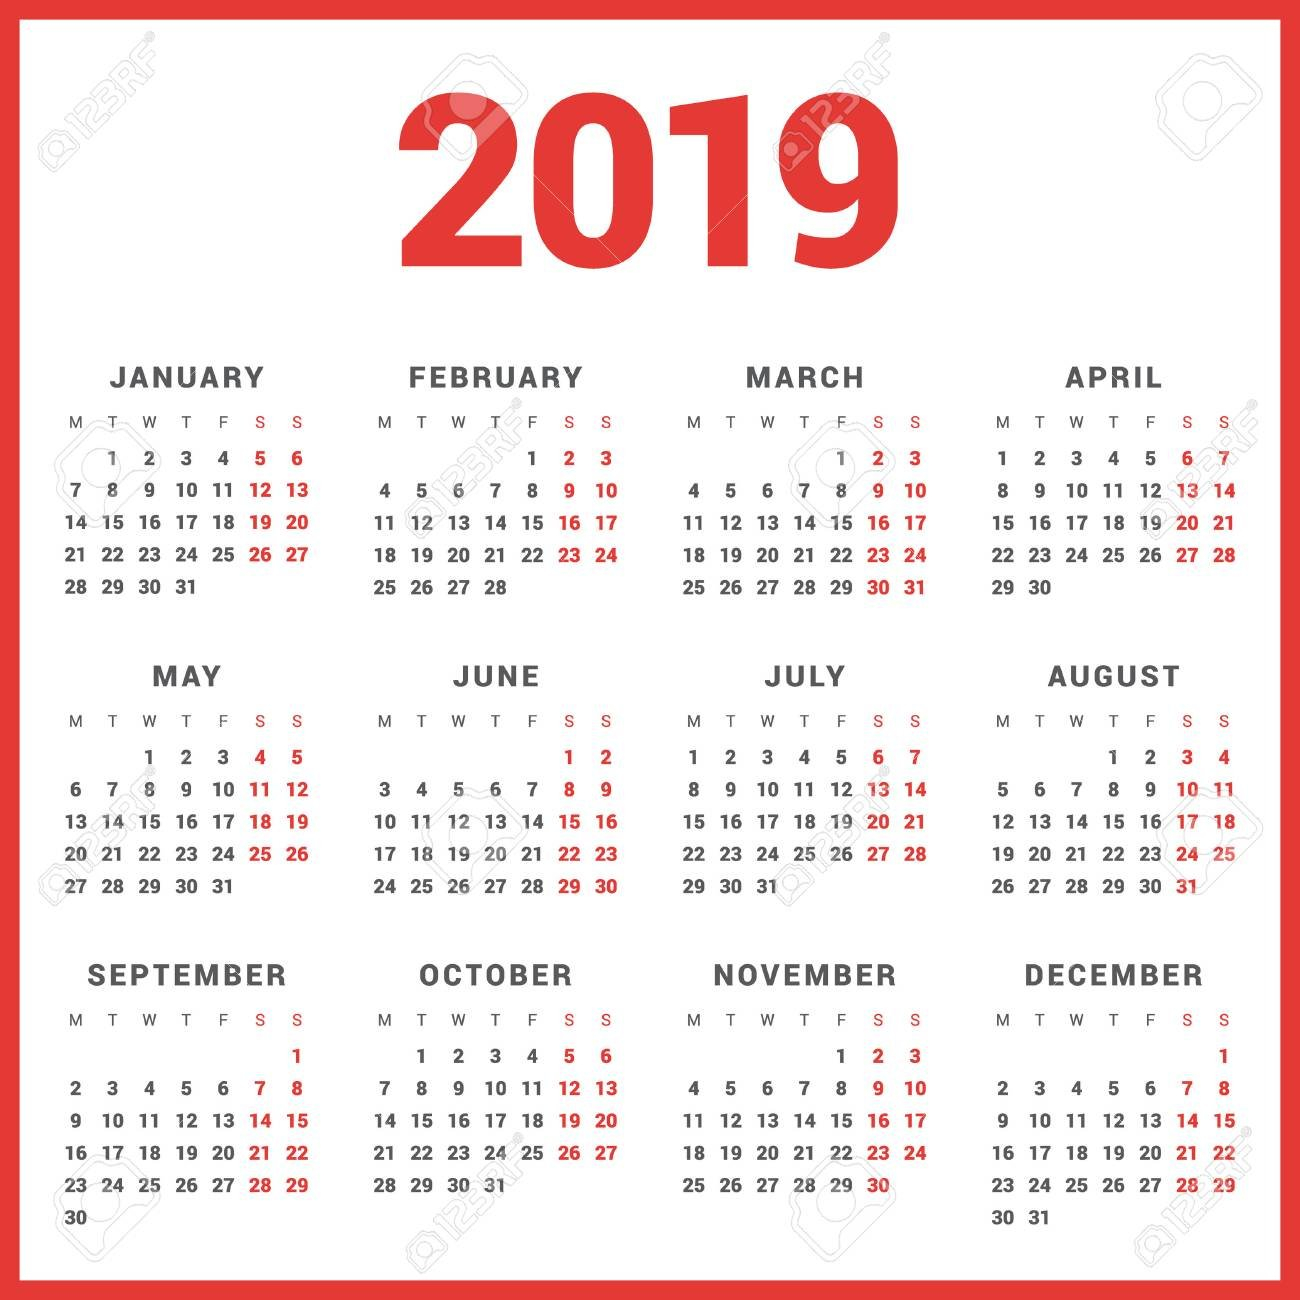 Calendar For 2019 Year On White Background. Week Starts Monday Calendar 2019